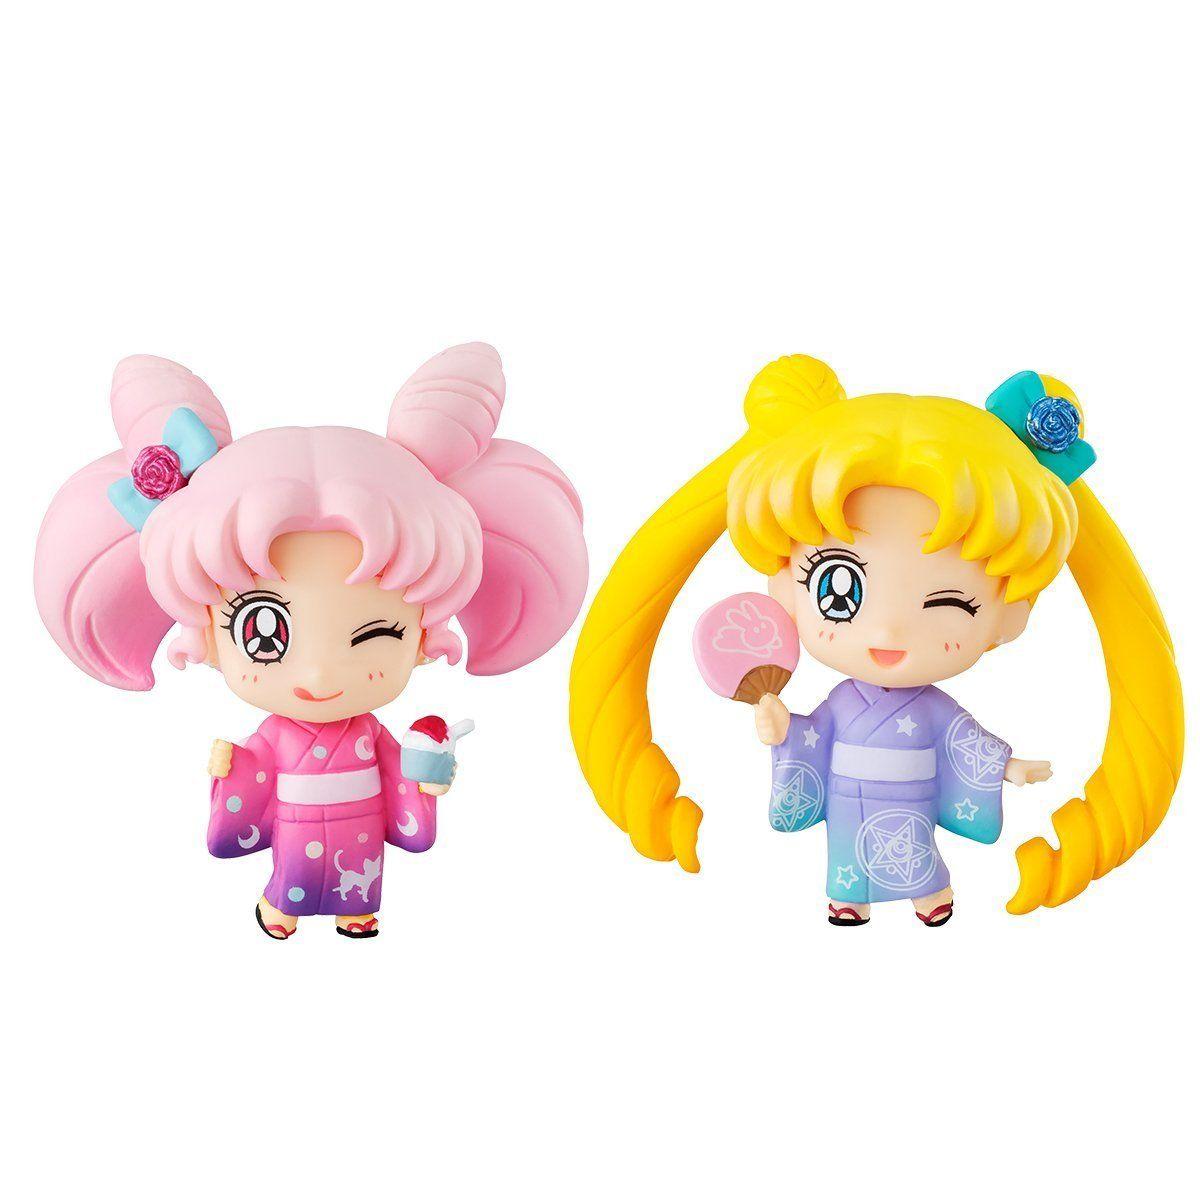 Set of 6 pcs Petit-Chara Pretty Guardian Sailor Moon Figure 2/'/'  new no box Gift